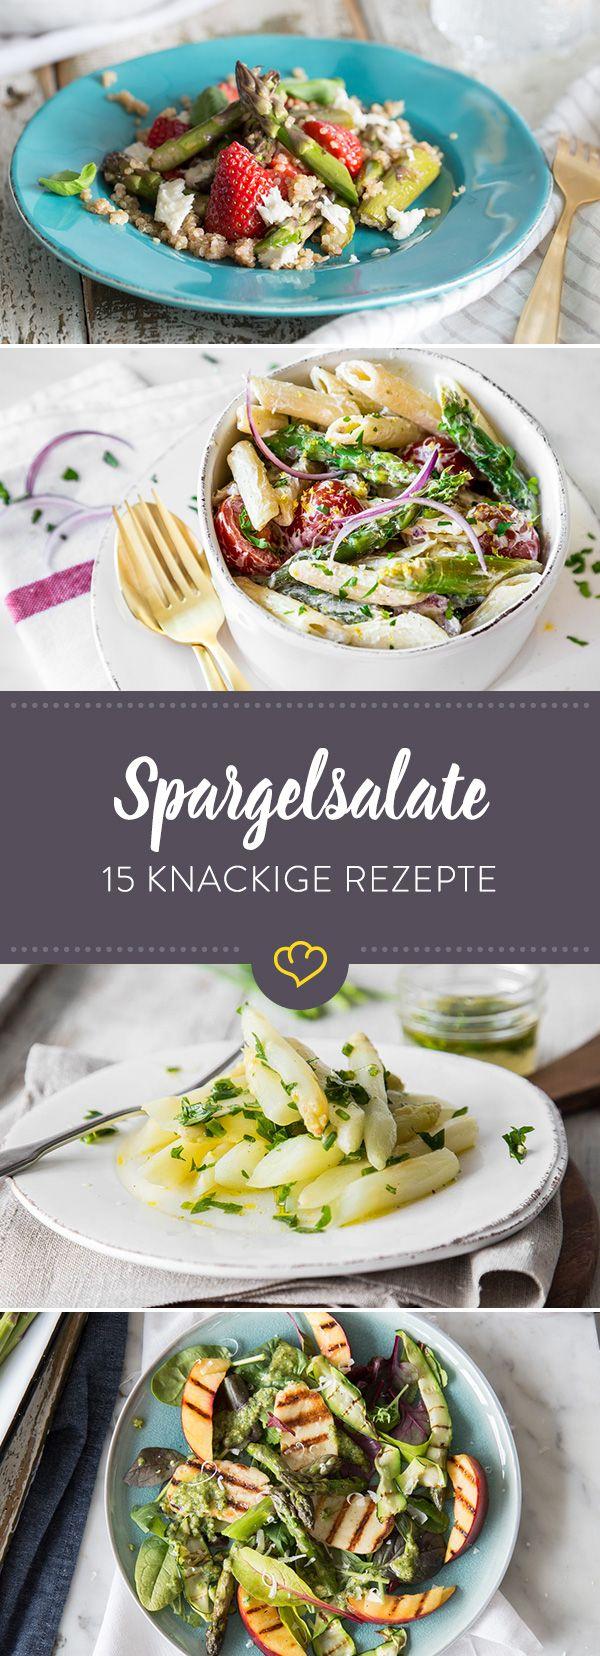 Ran an die Stangen: 15 knackige Spargelsalate für den Frühling